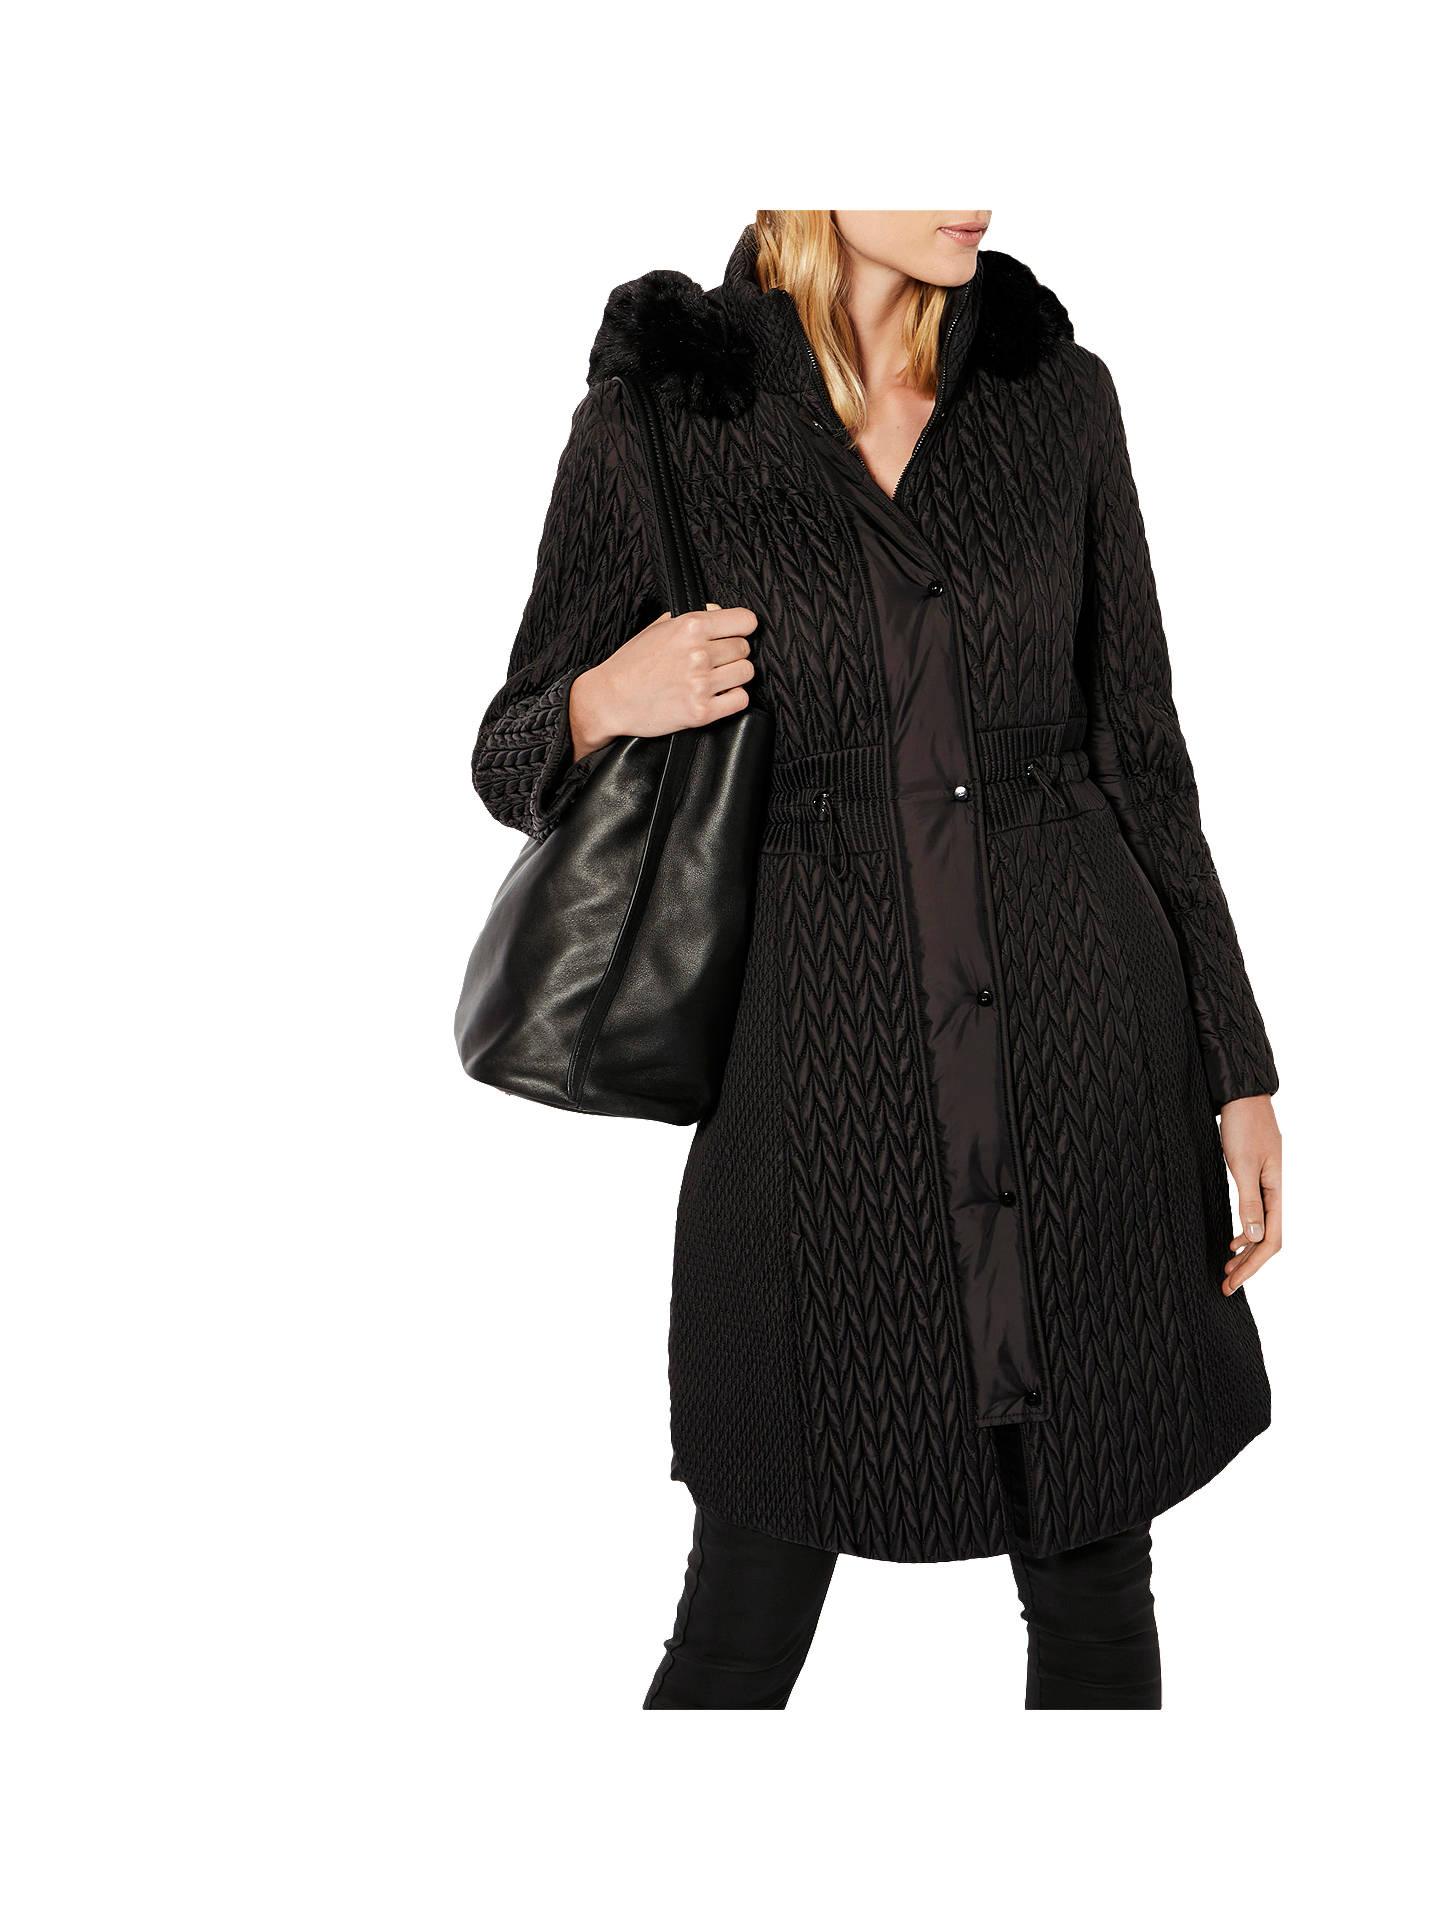 0b97d380b7 Buy Karen Millen Lightweight Padded Coat, Black, 6 Online at johnlewis.com  ...